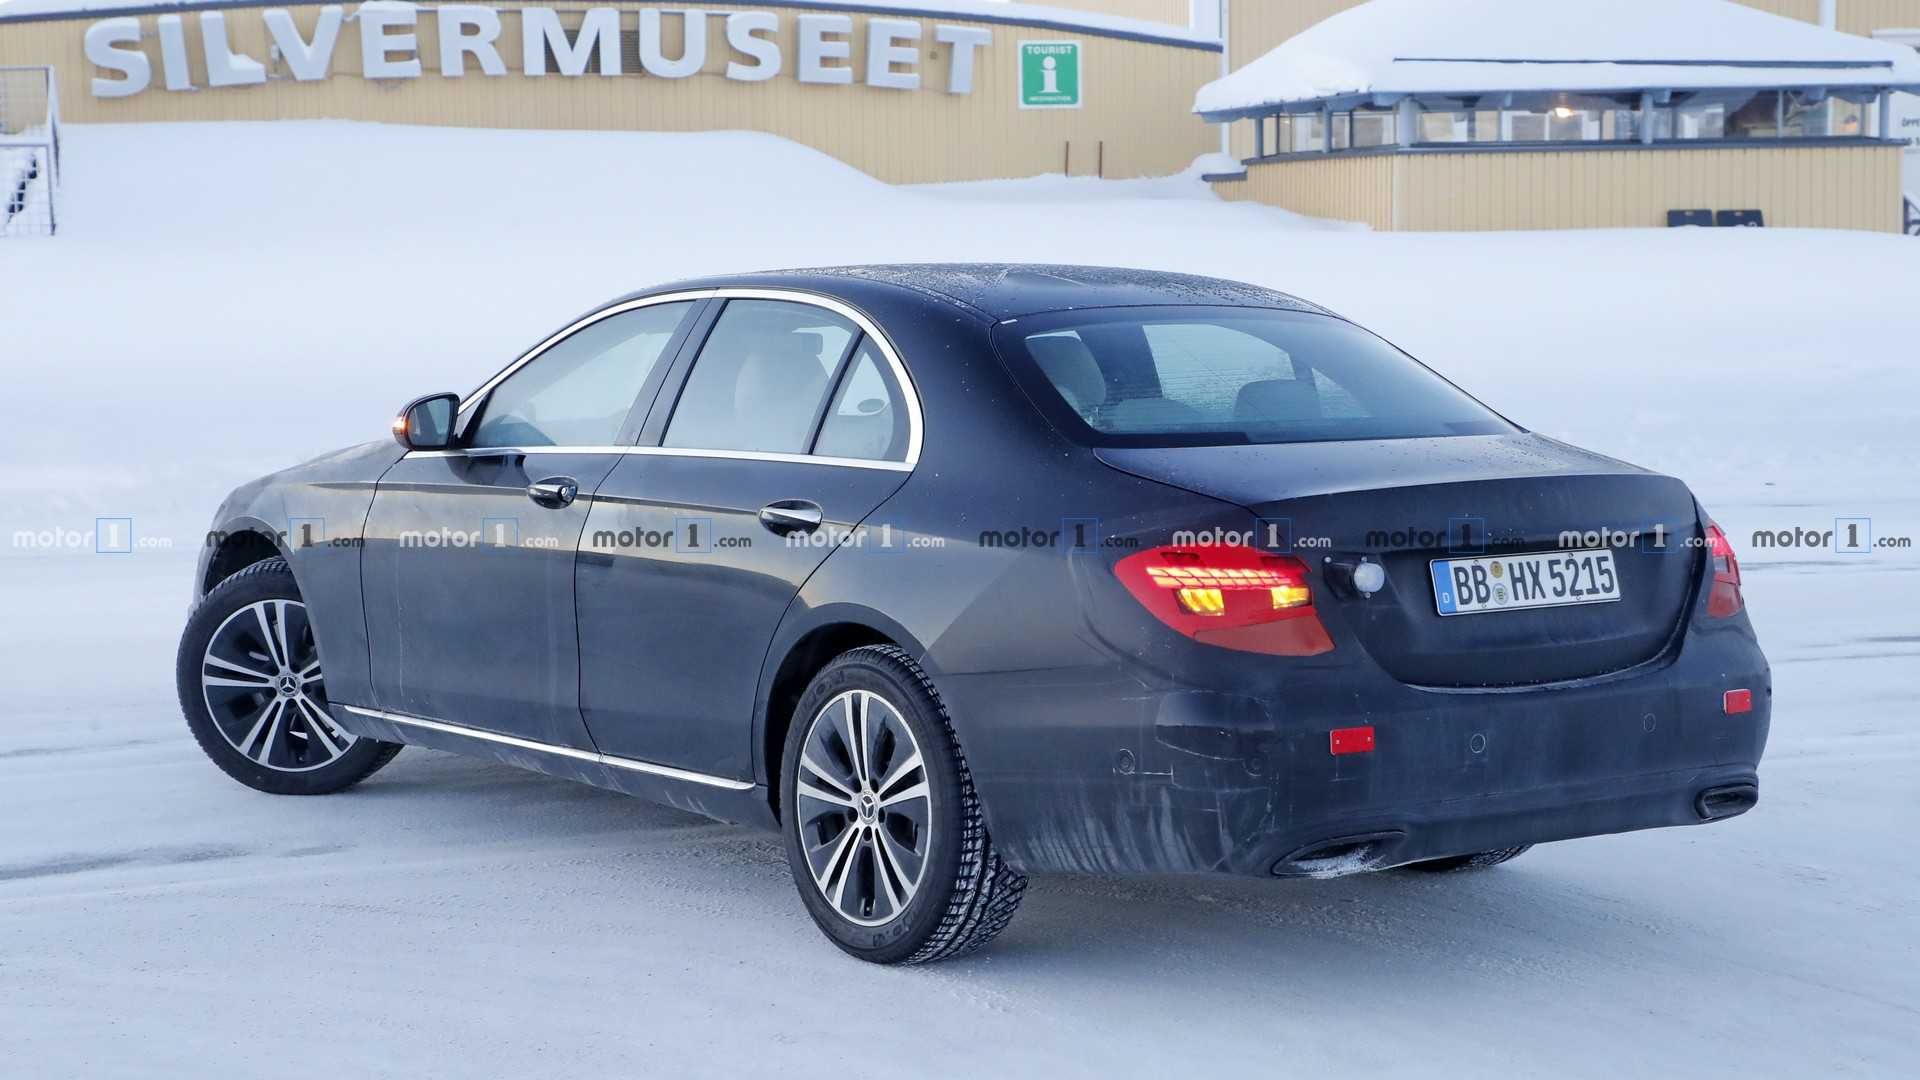 2020-mercedes-e-class-sedan-spy-photo-3.jpg